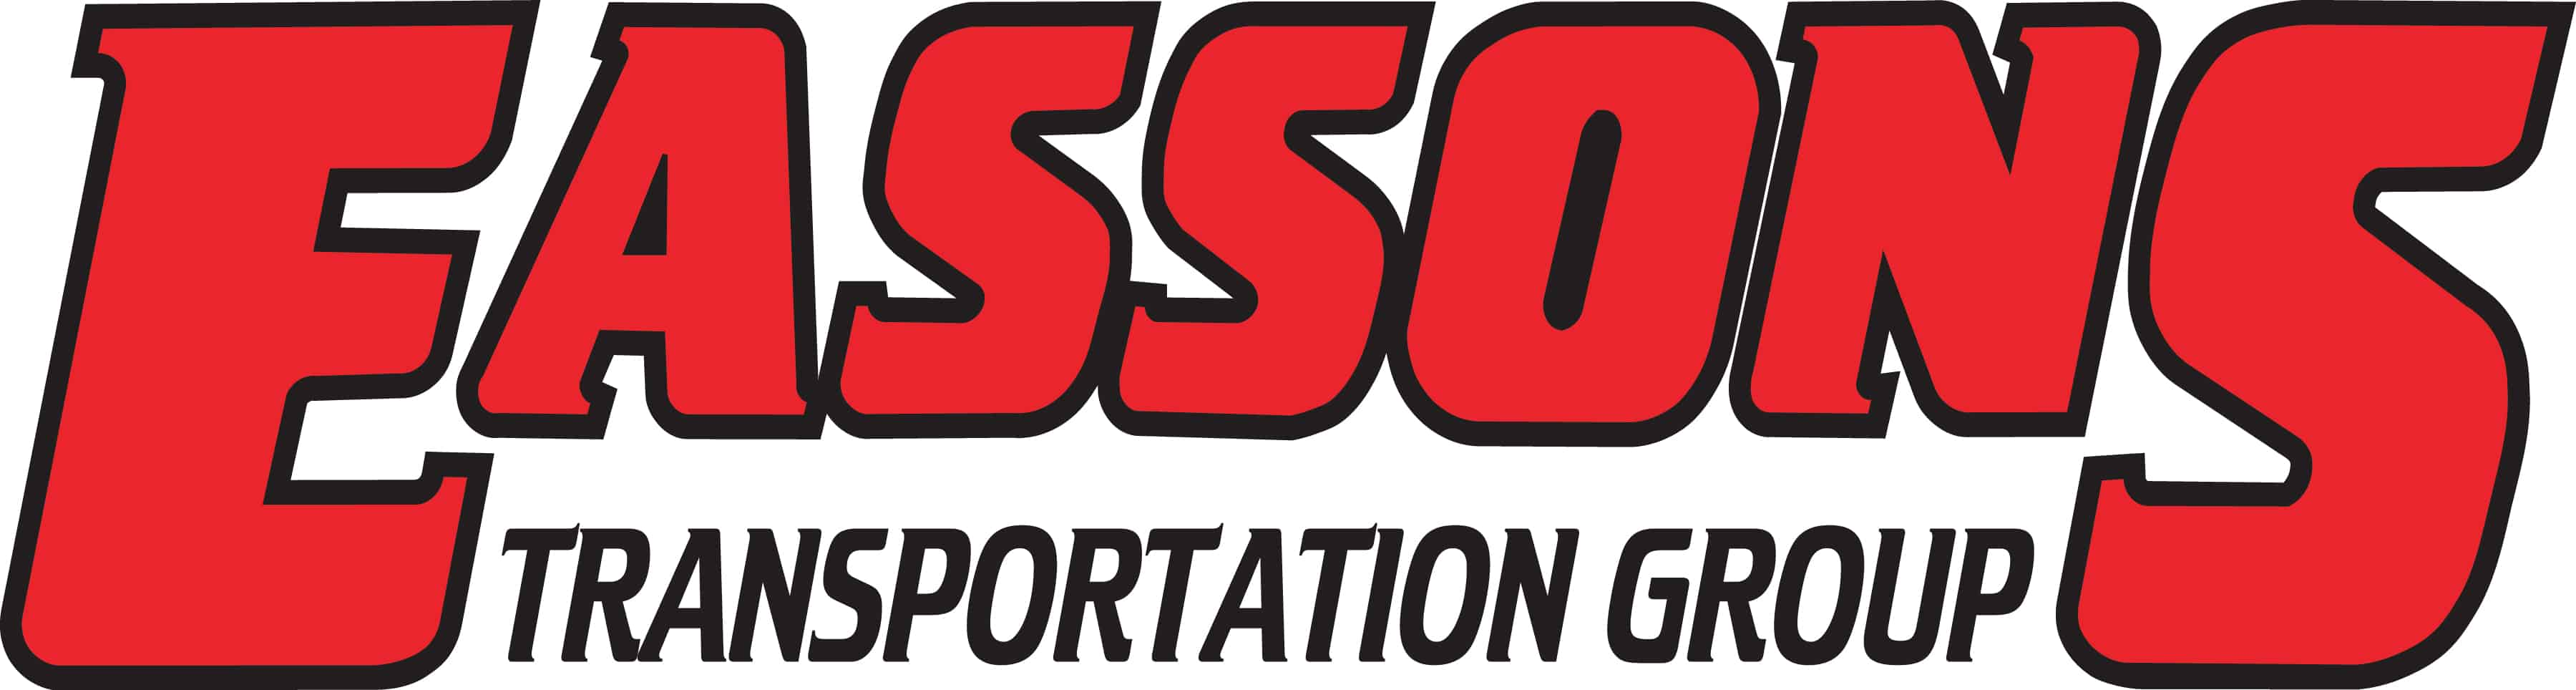 eassons logo